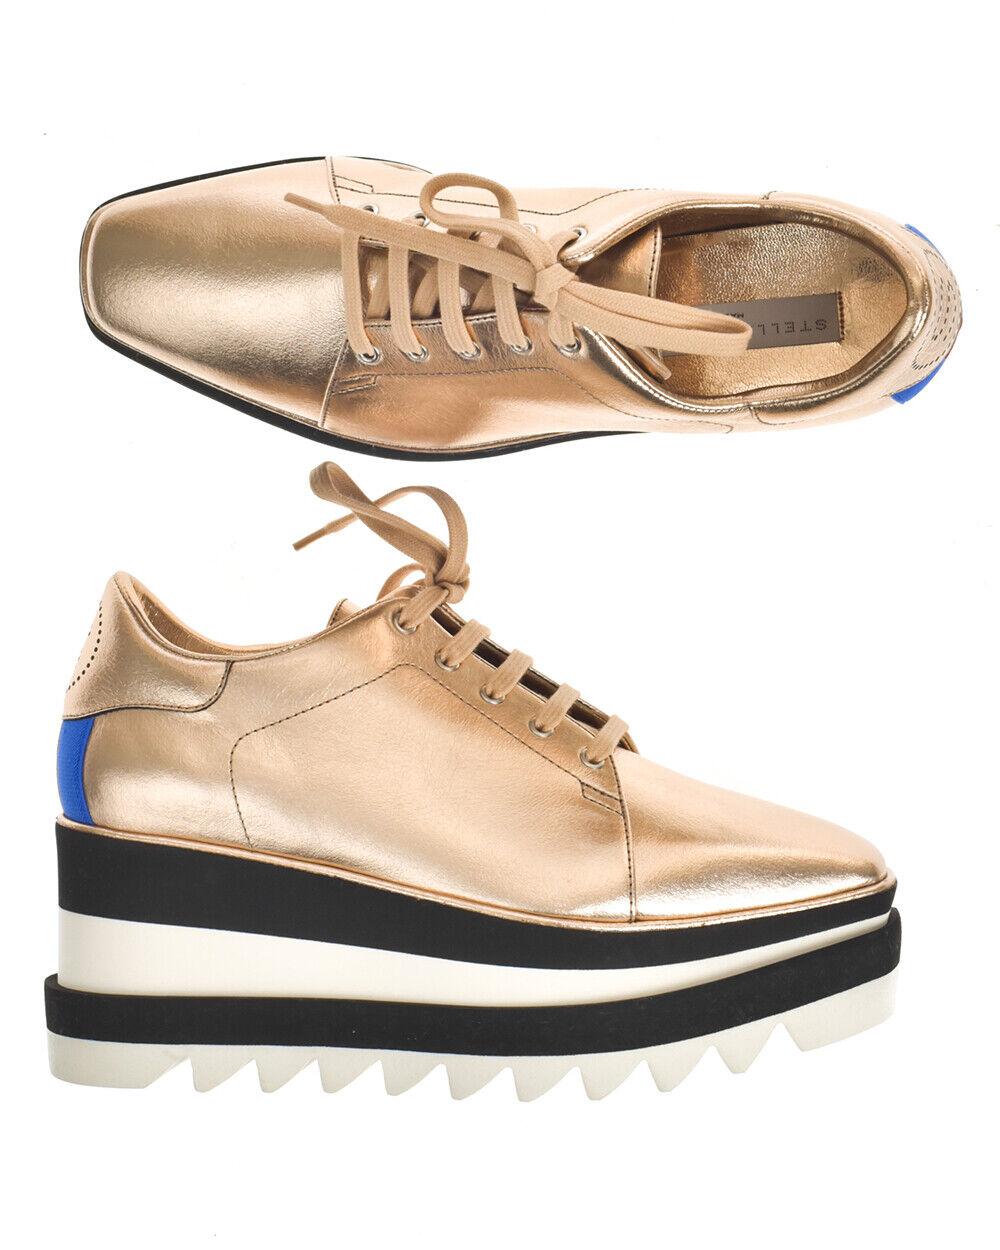 Stella McCartney zapatos italy zapatillas Elyse mujer made in italy zapatos oro 478958w1cw3 8395 4a83e6